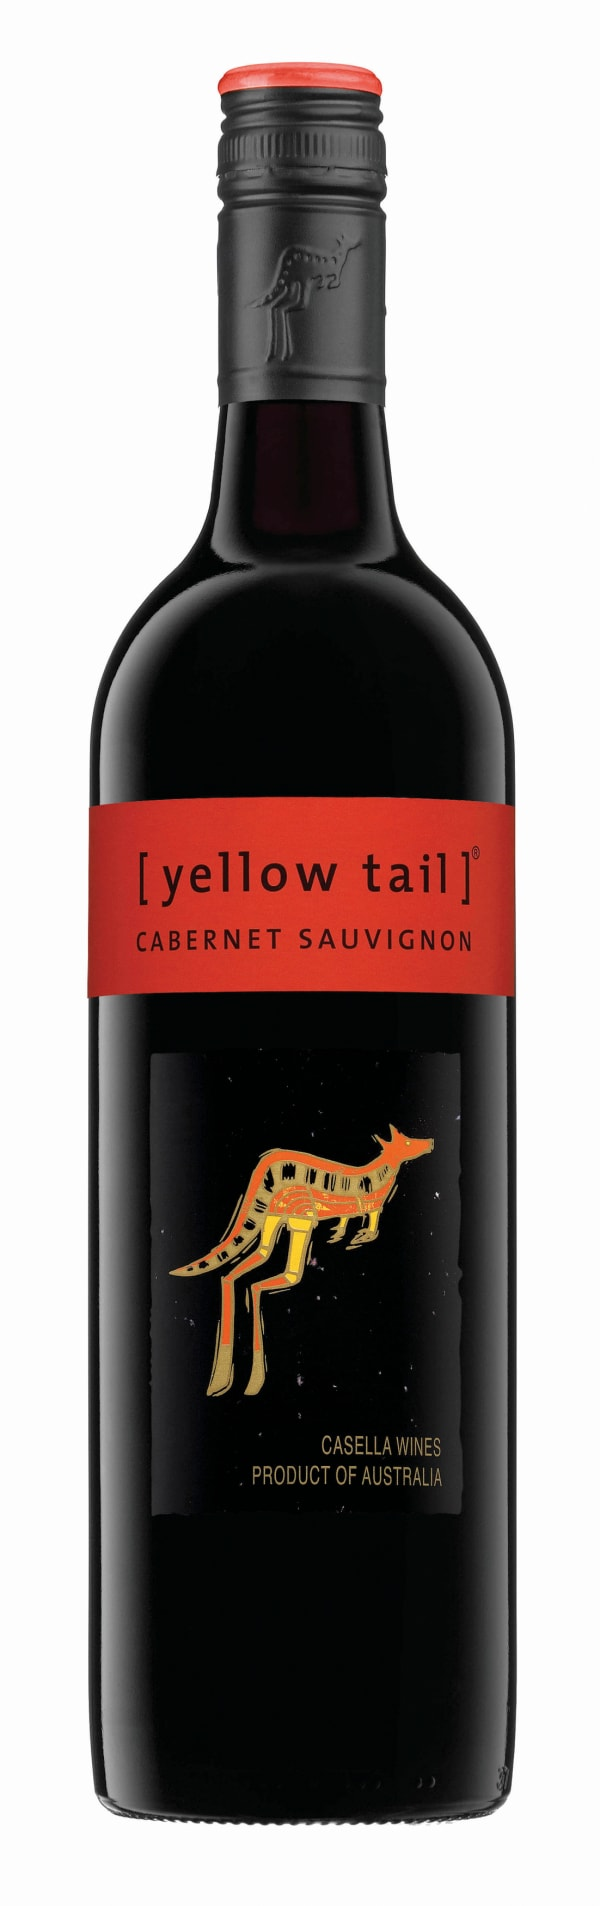 Yellow Tail Cabernet Sauvignon 2019